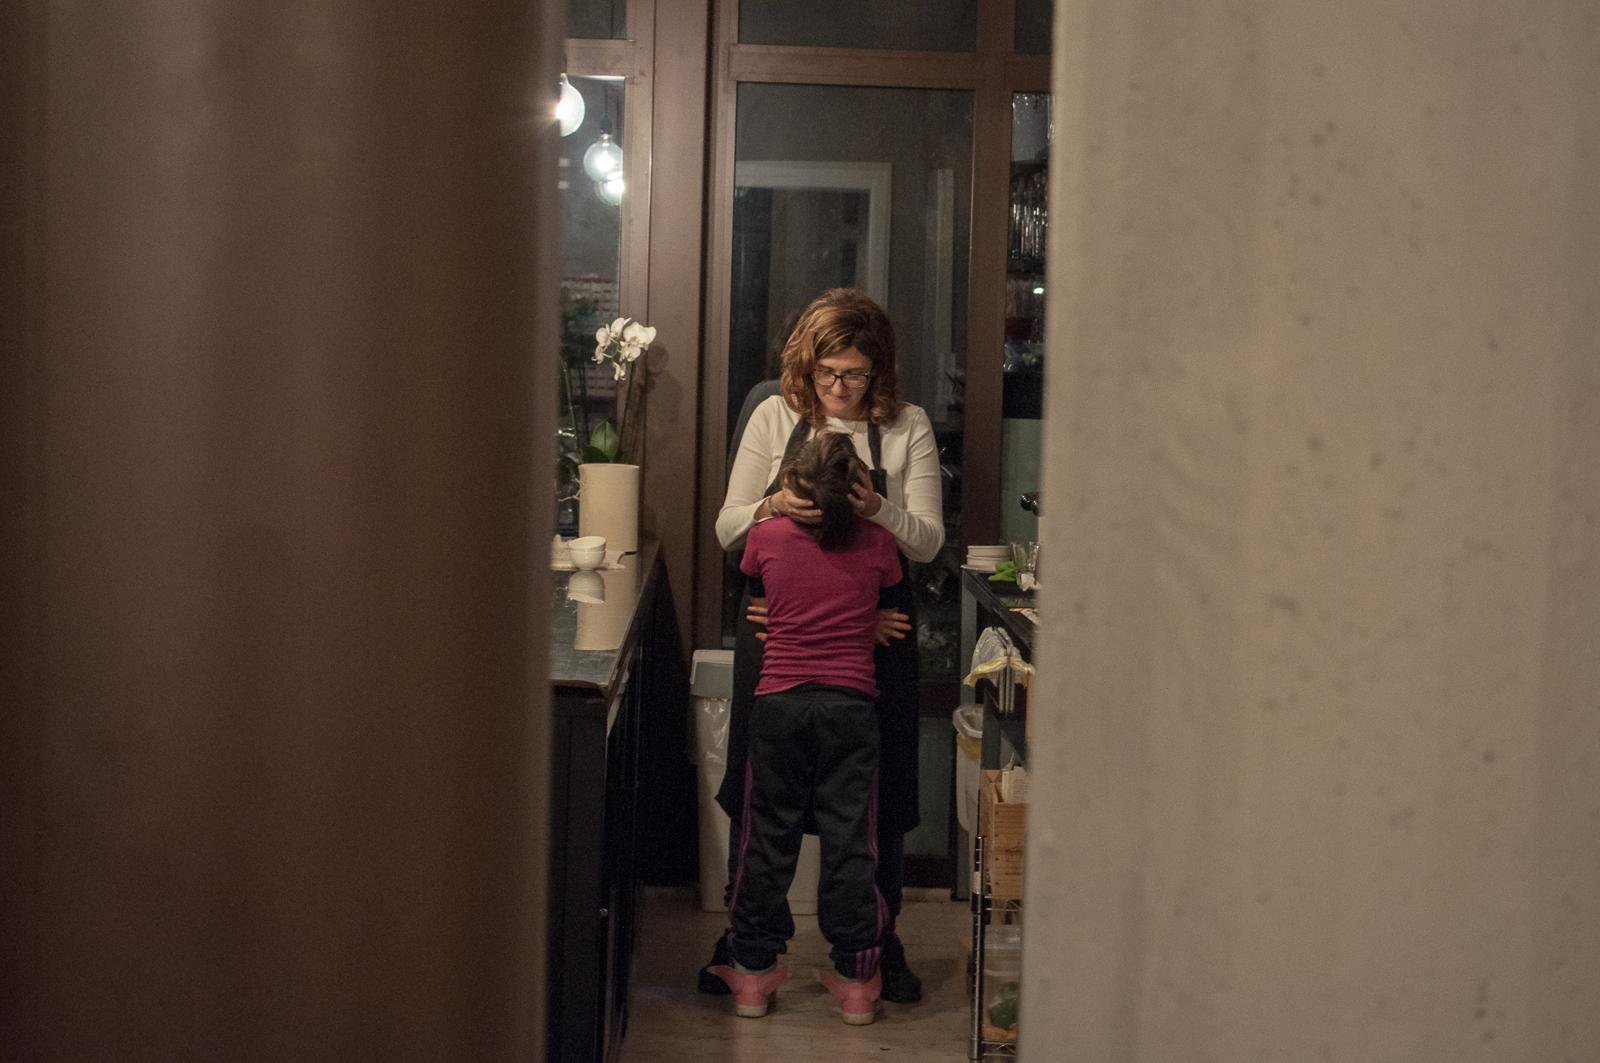 Ombretta gets a hug